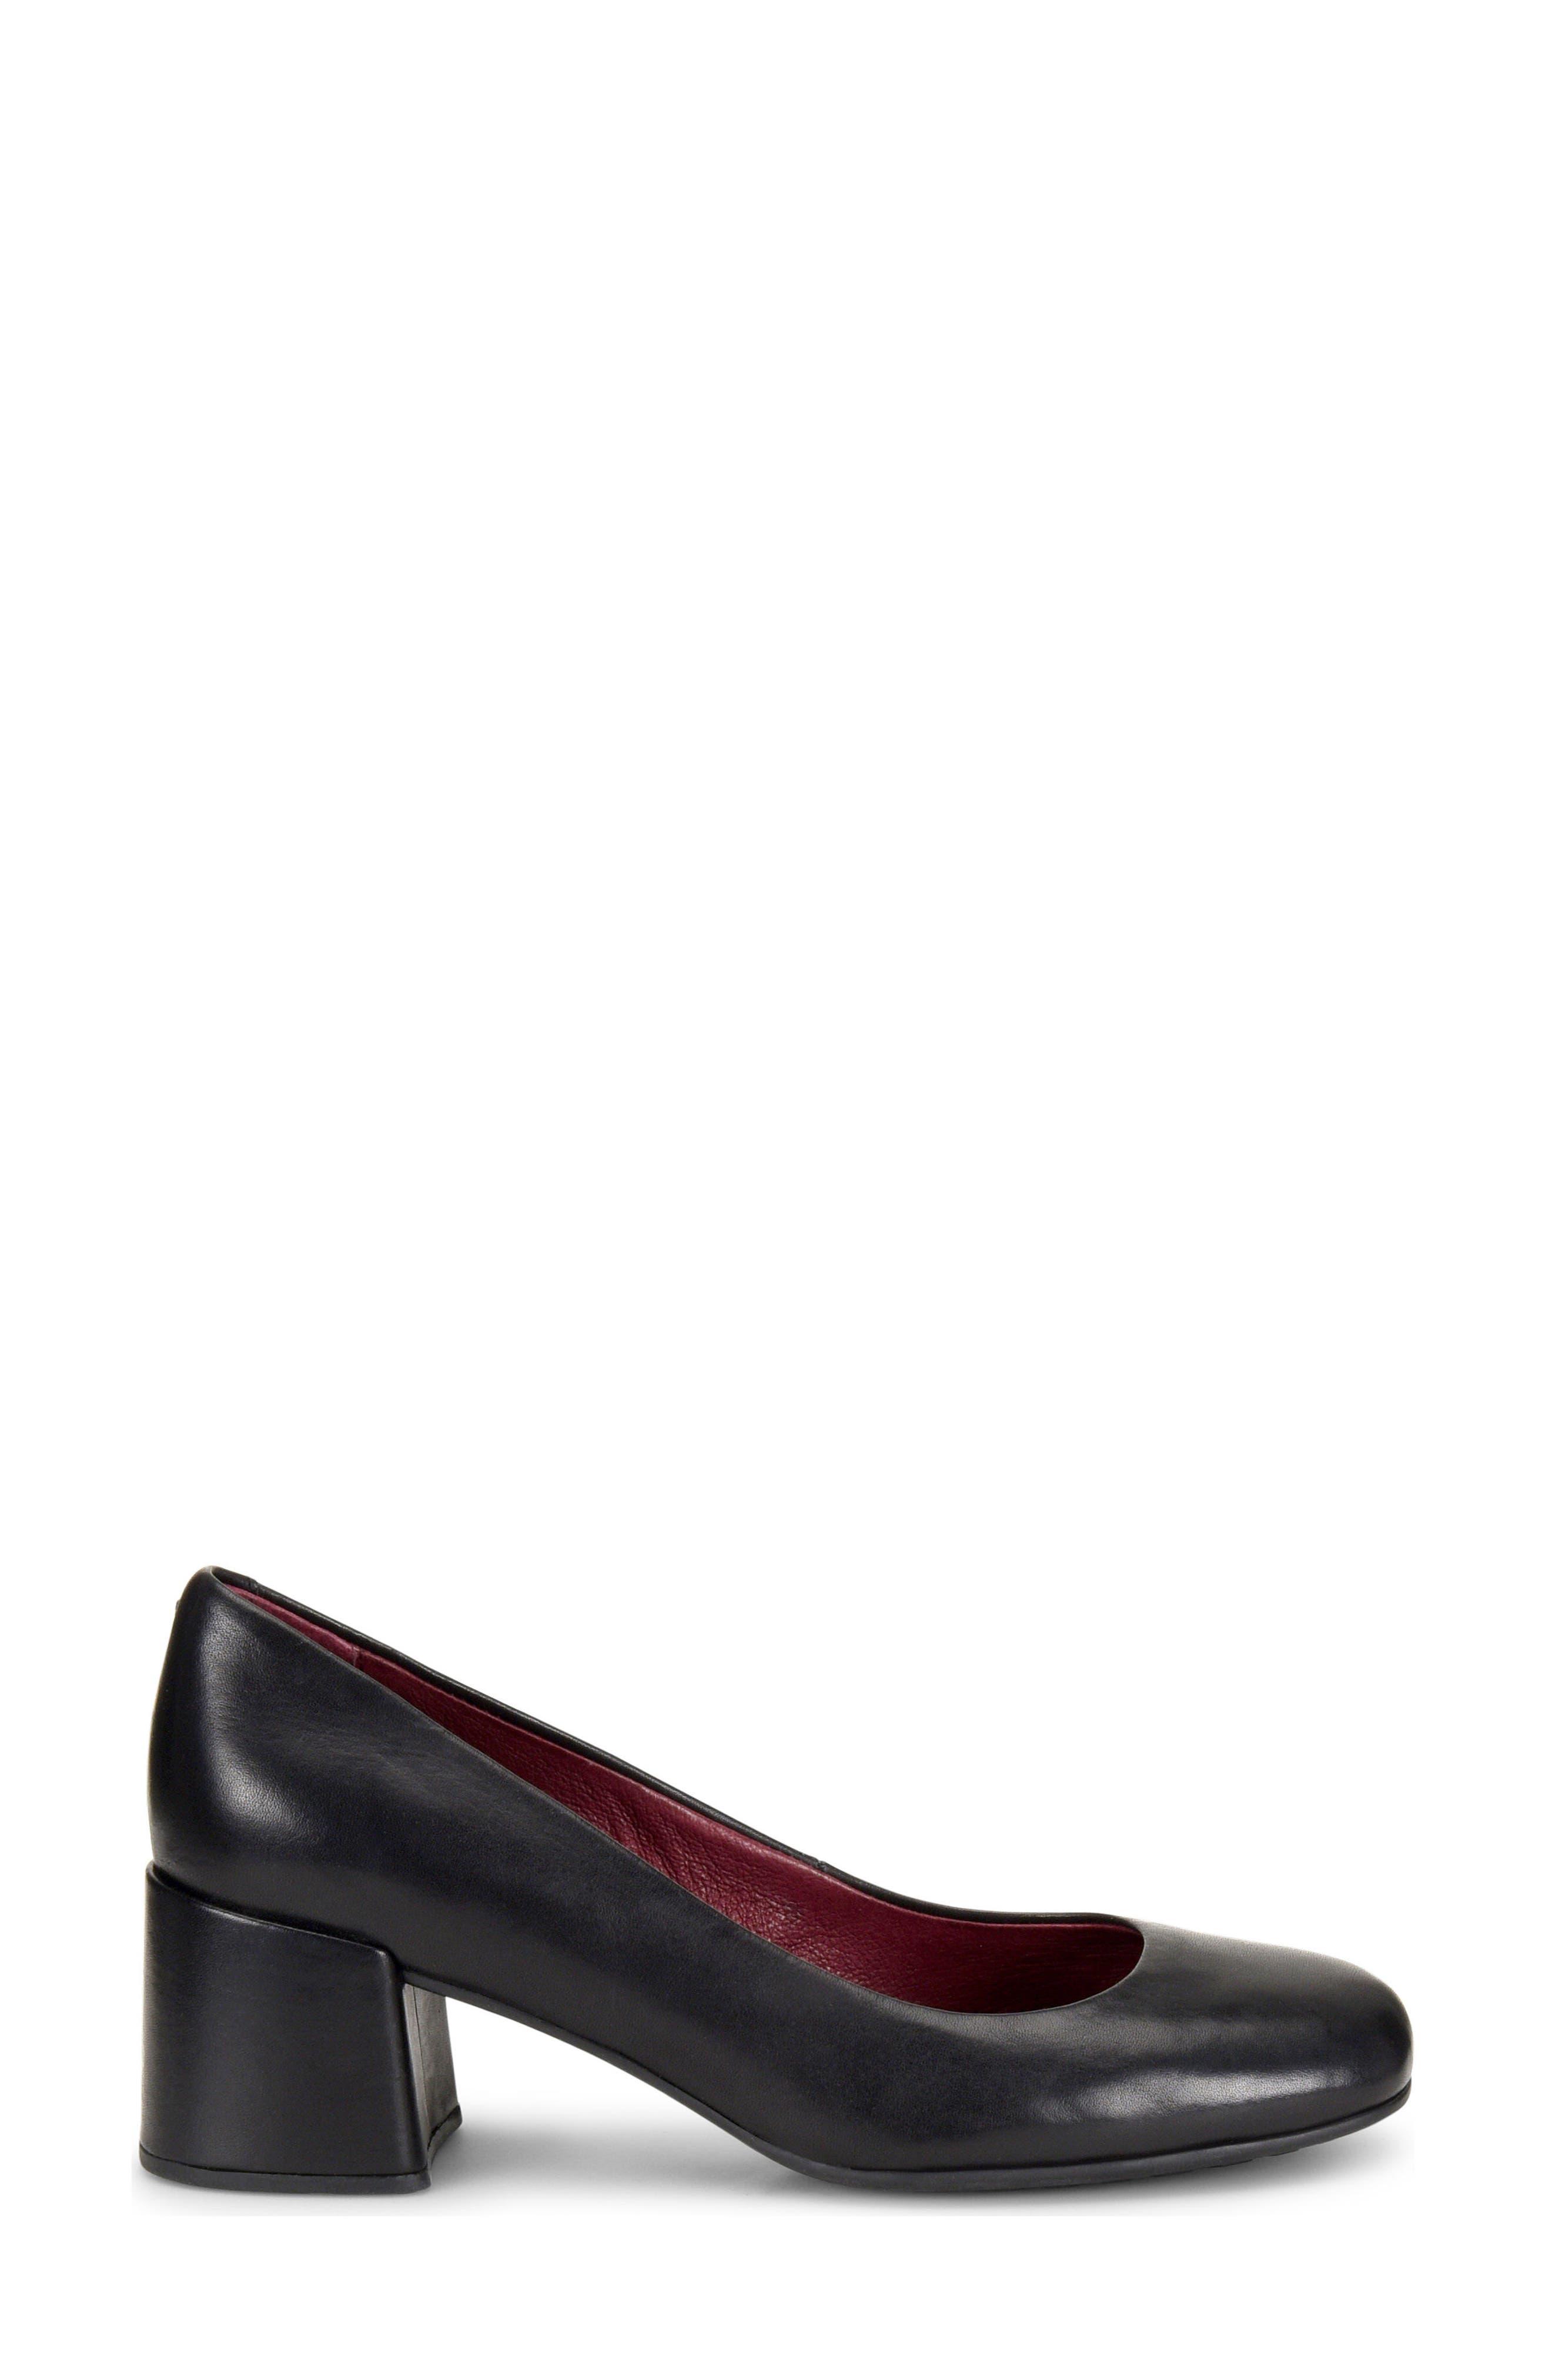 Magnolia Block Heel Pump,                             Alternate thumbnail 3, color,                             Black Leather